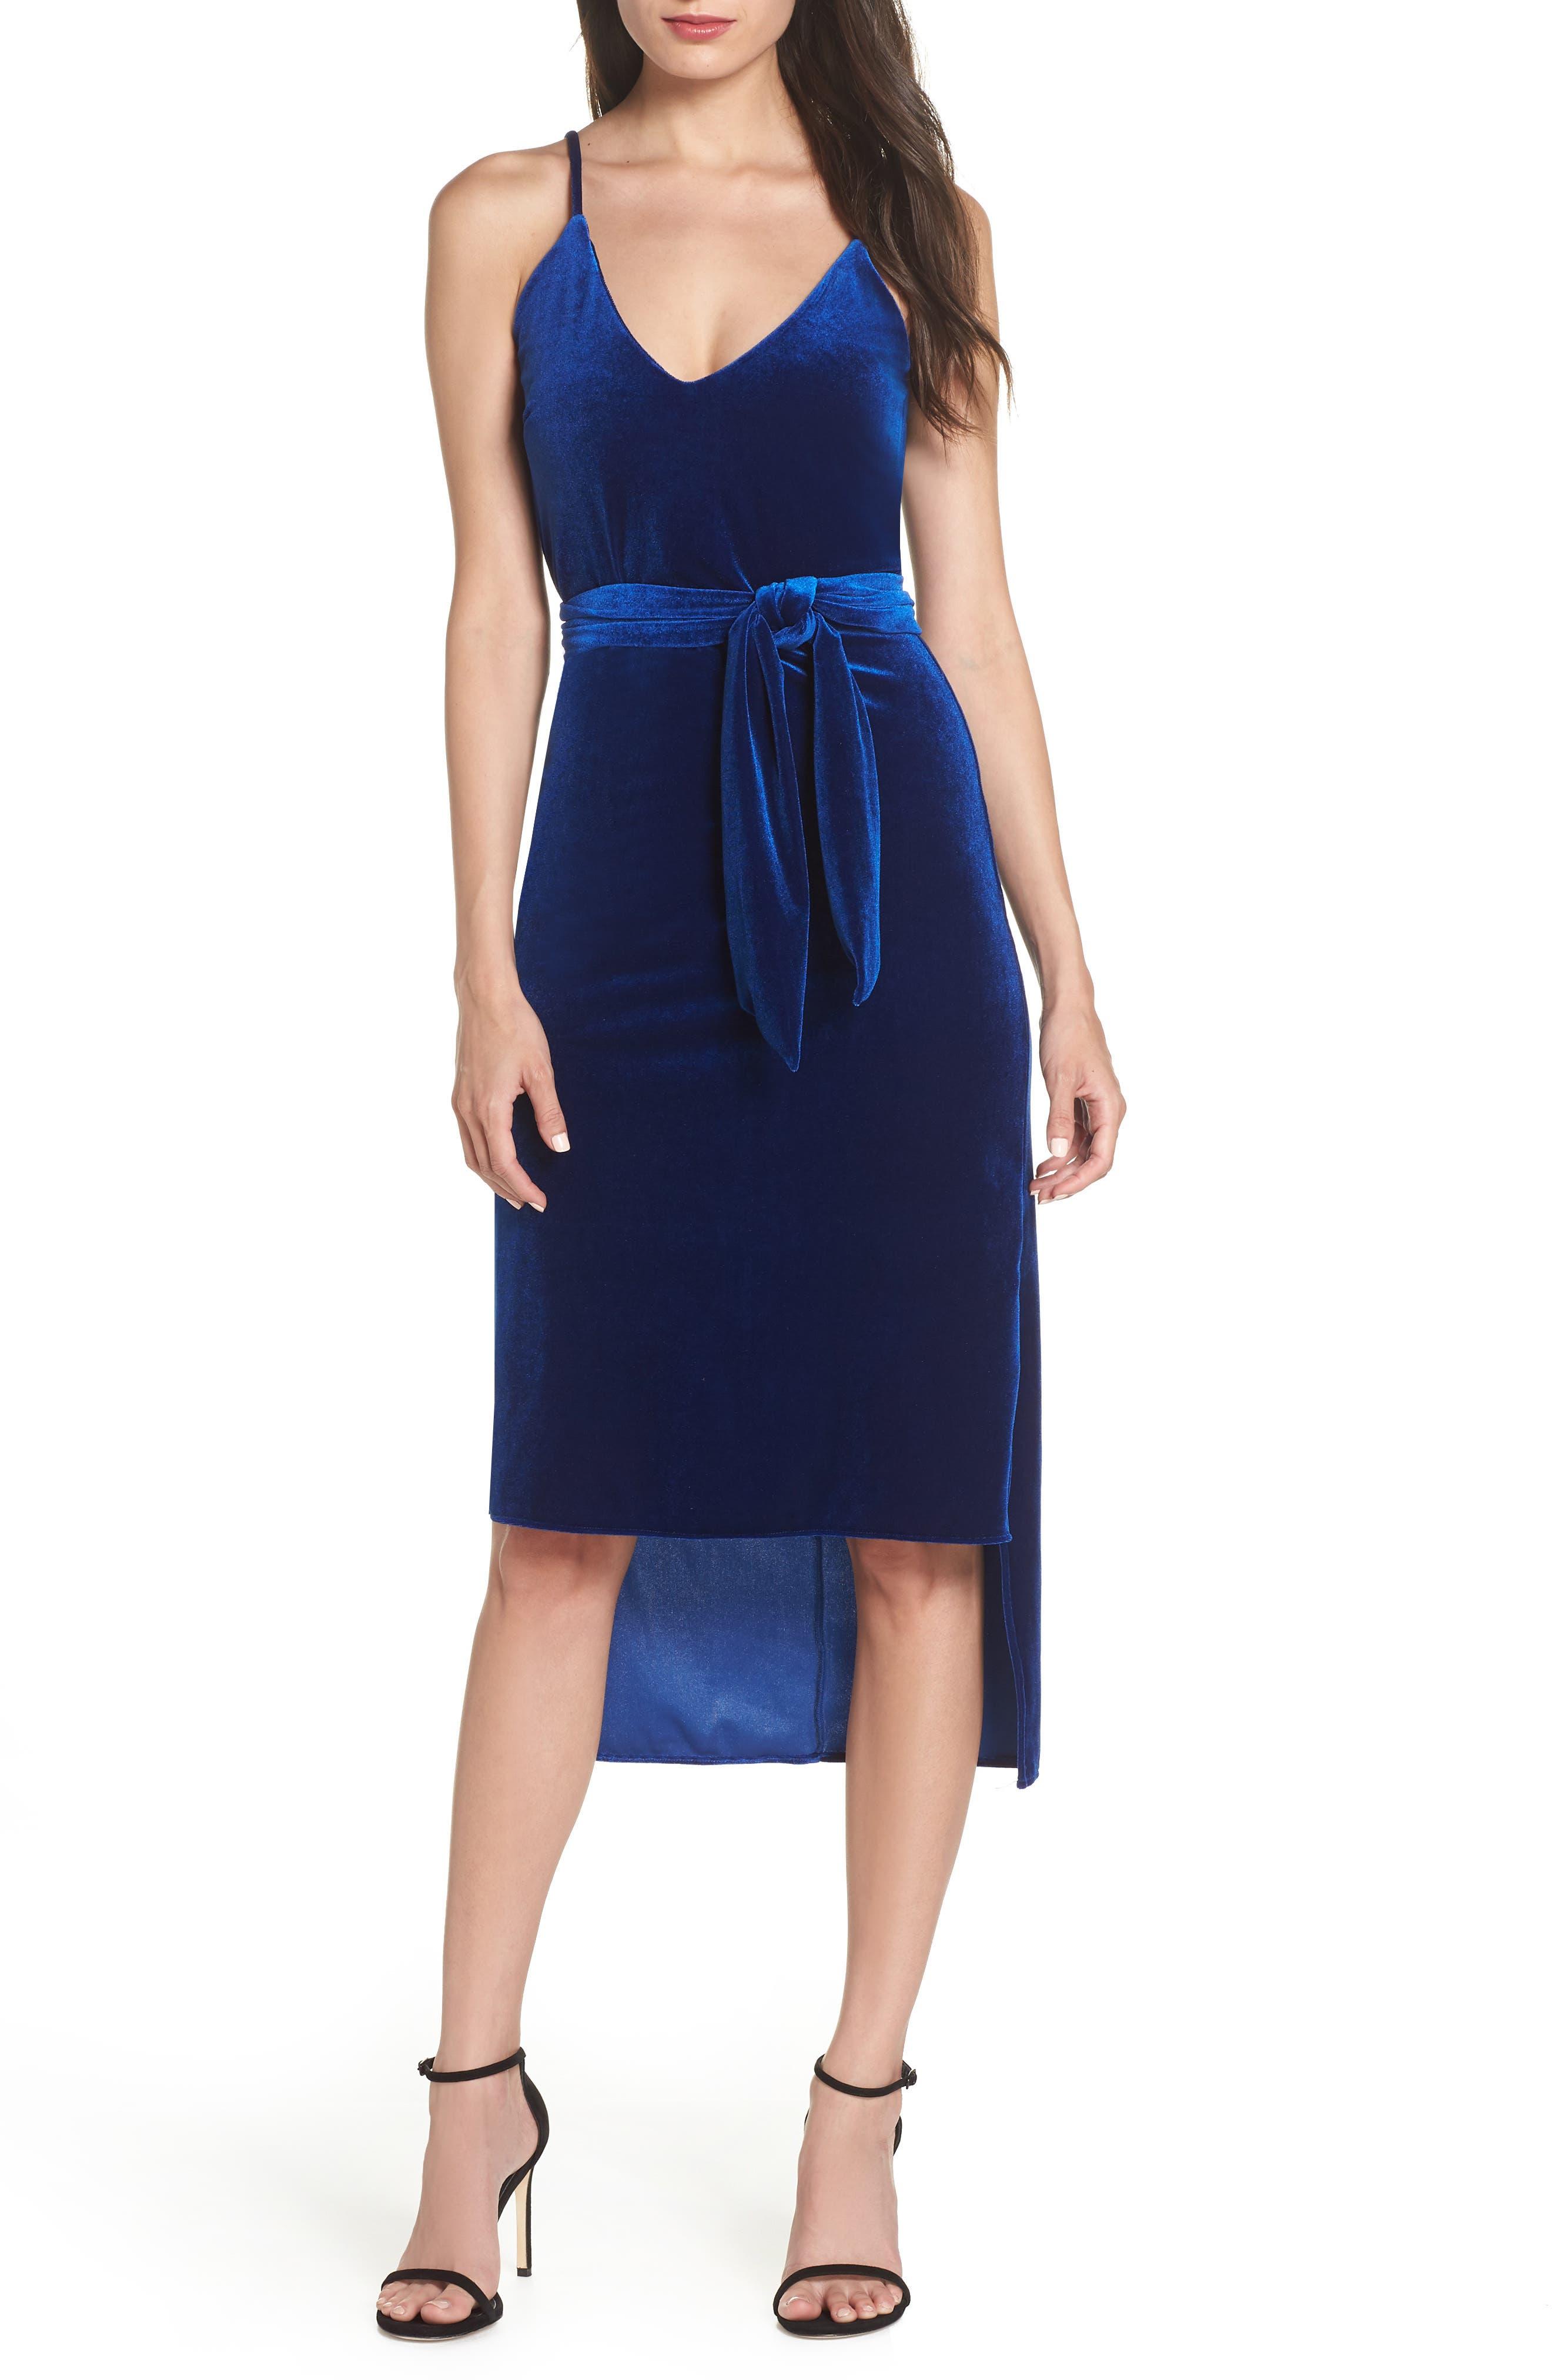 Nsr Diana Velvet Tie Waist High/low Dress